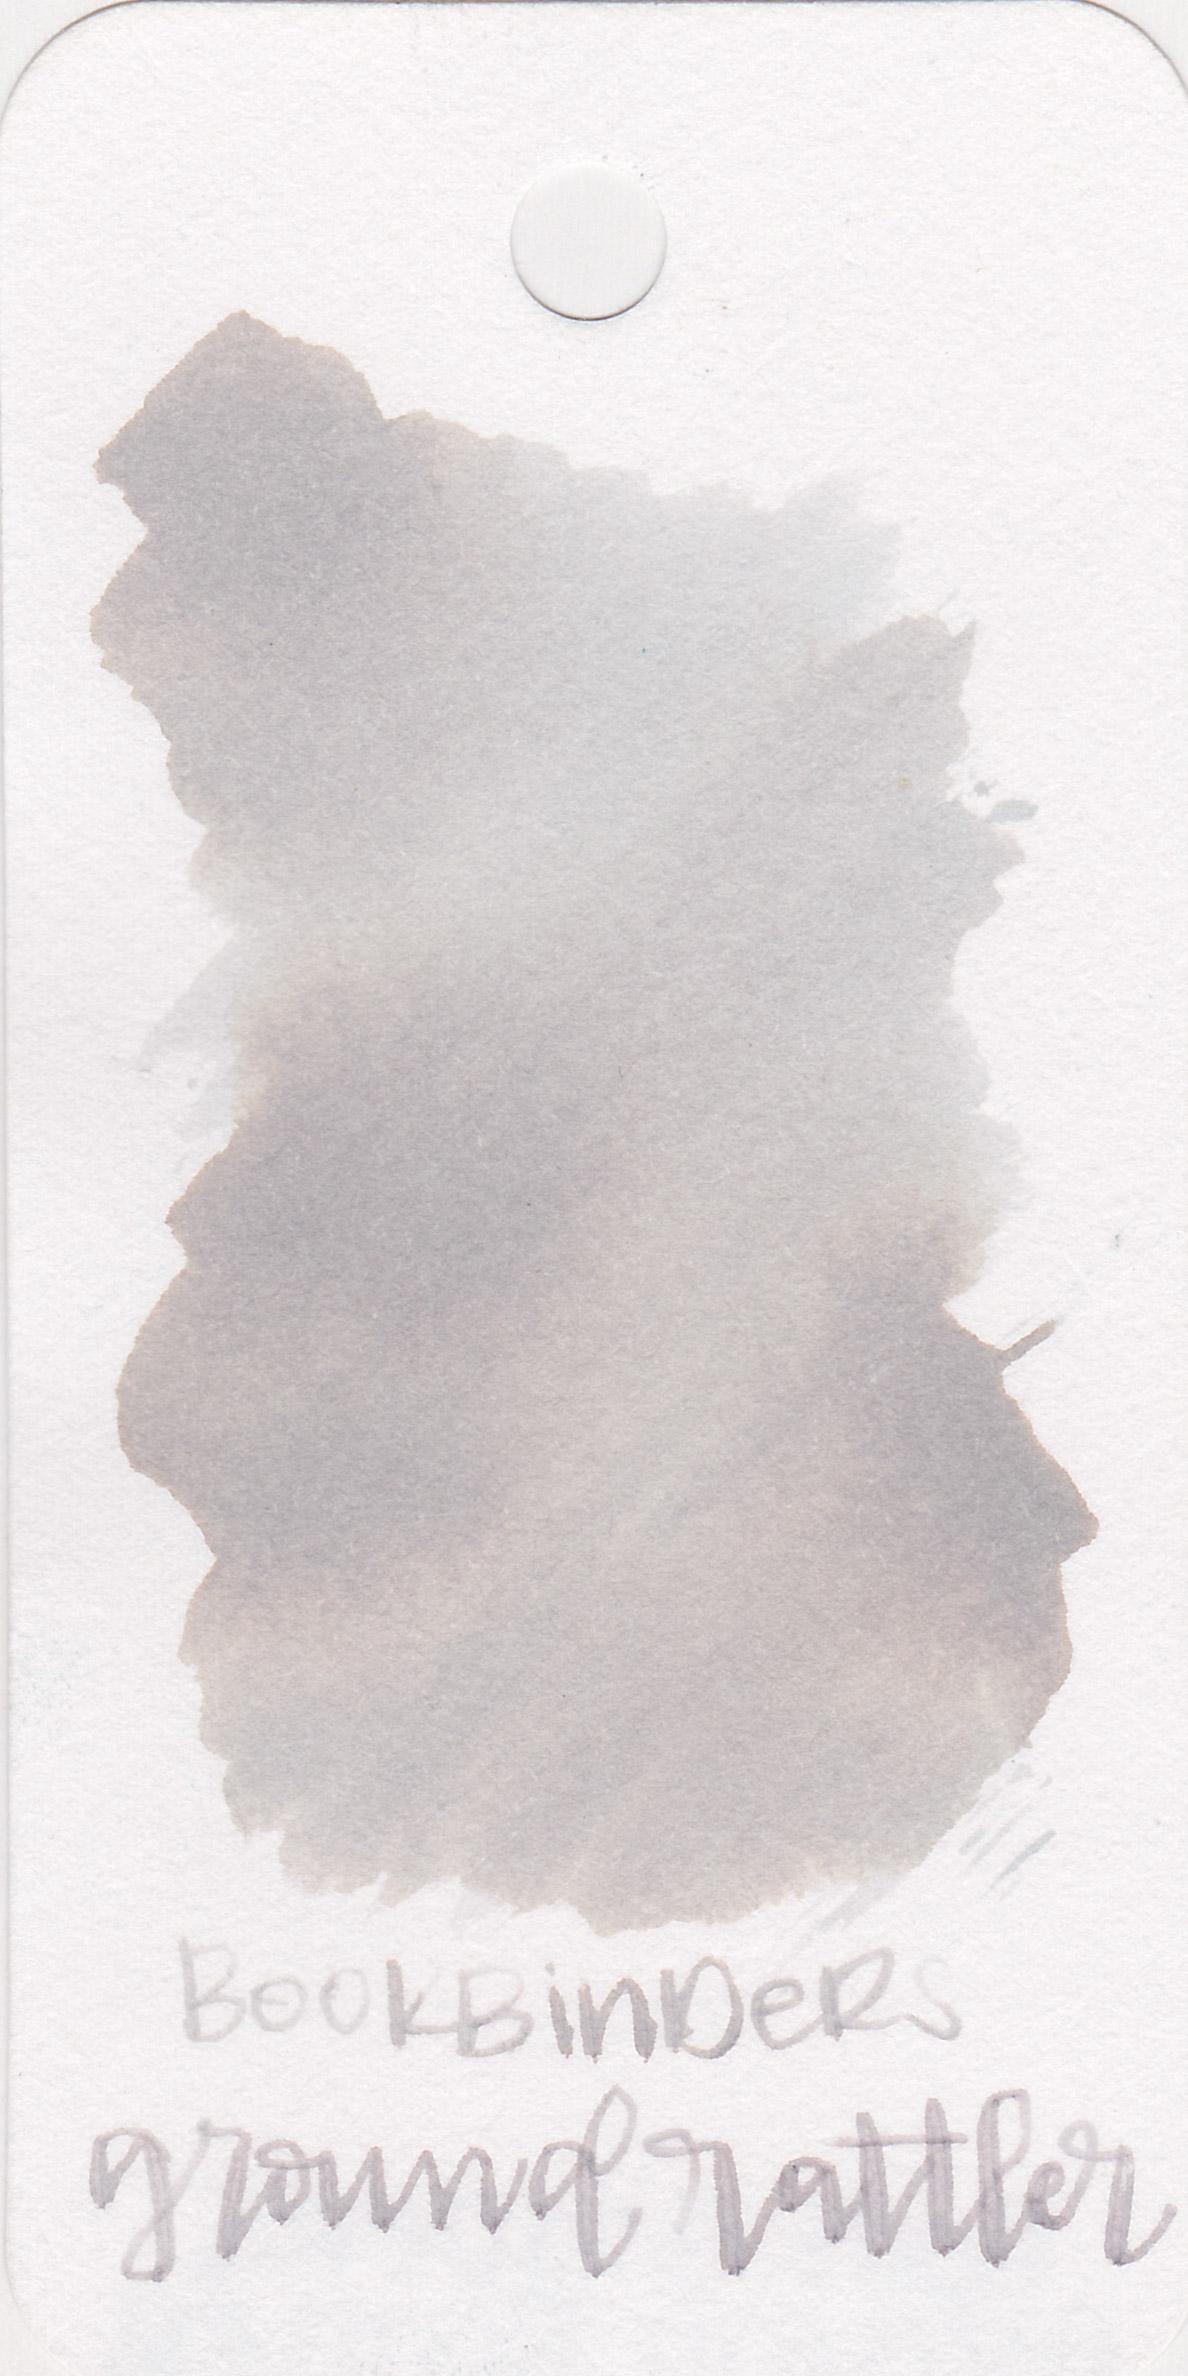 bkb-ground-rattler-1.jpg